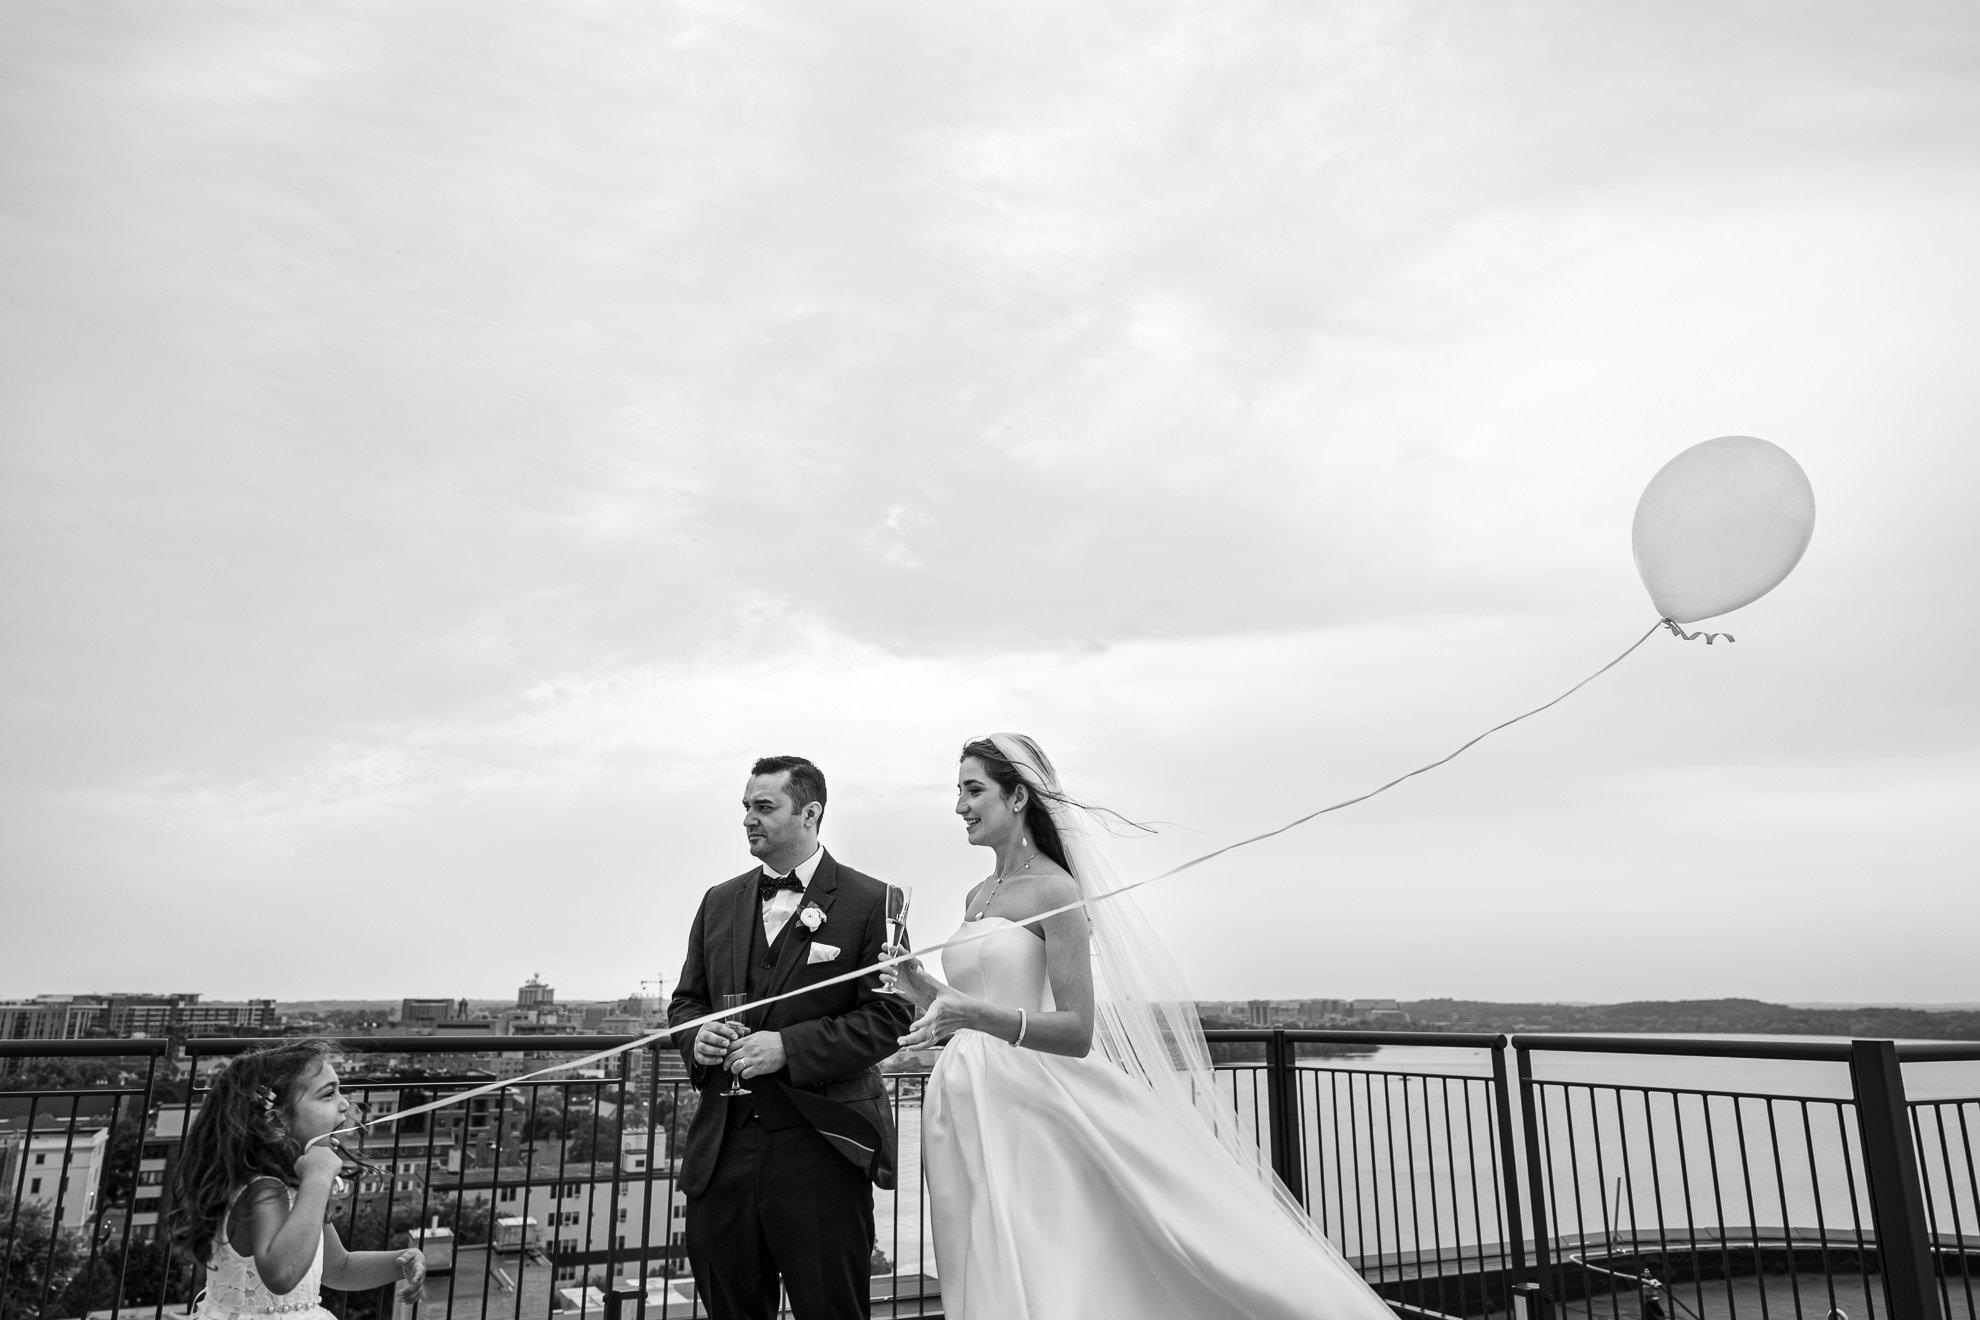 flower girl balloon bride and groom